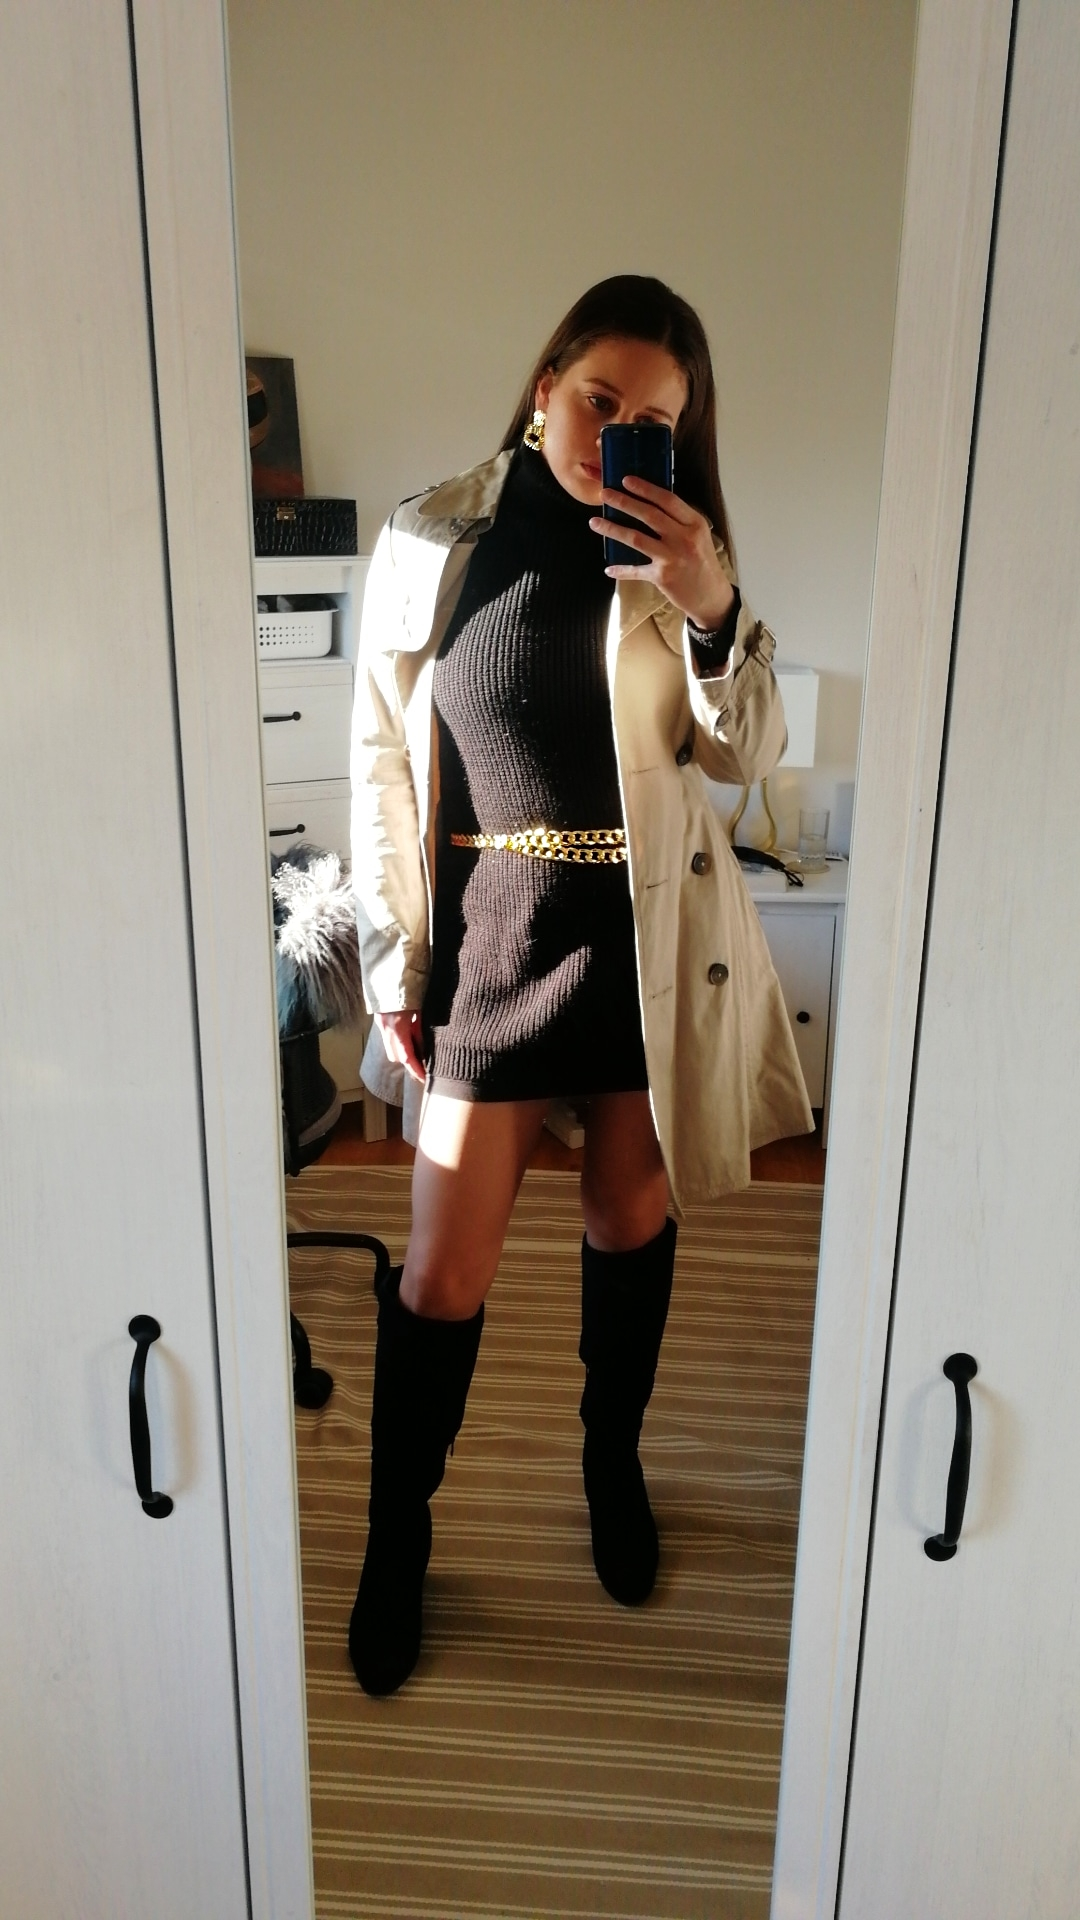 isalicious-blogg-blog-blogger-blogging-mote-trend-stil-fashion-style-ootod-outfit-antrekk-17mai-17maiantrekk-makeup-sminke-look-nasjonaldagen-kjole-boohoo-3.png